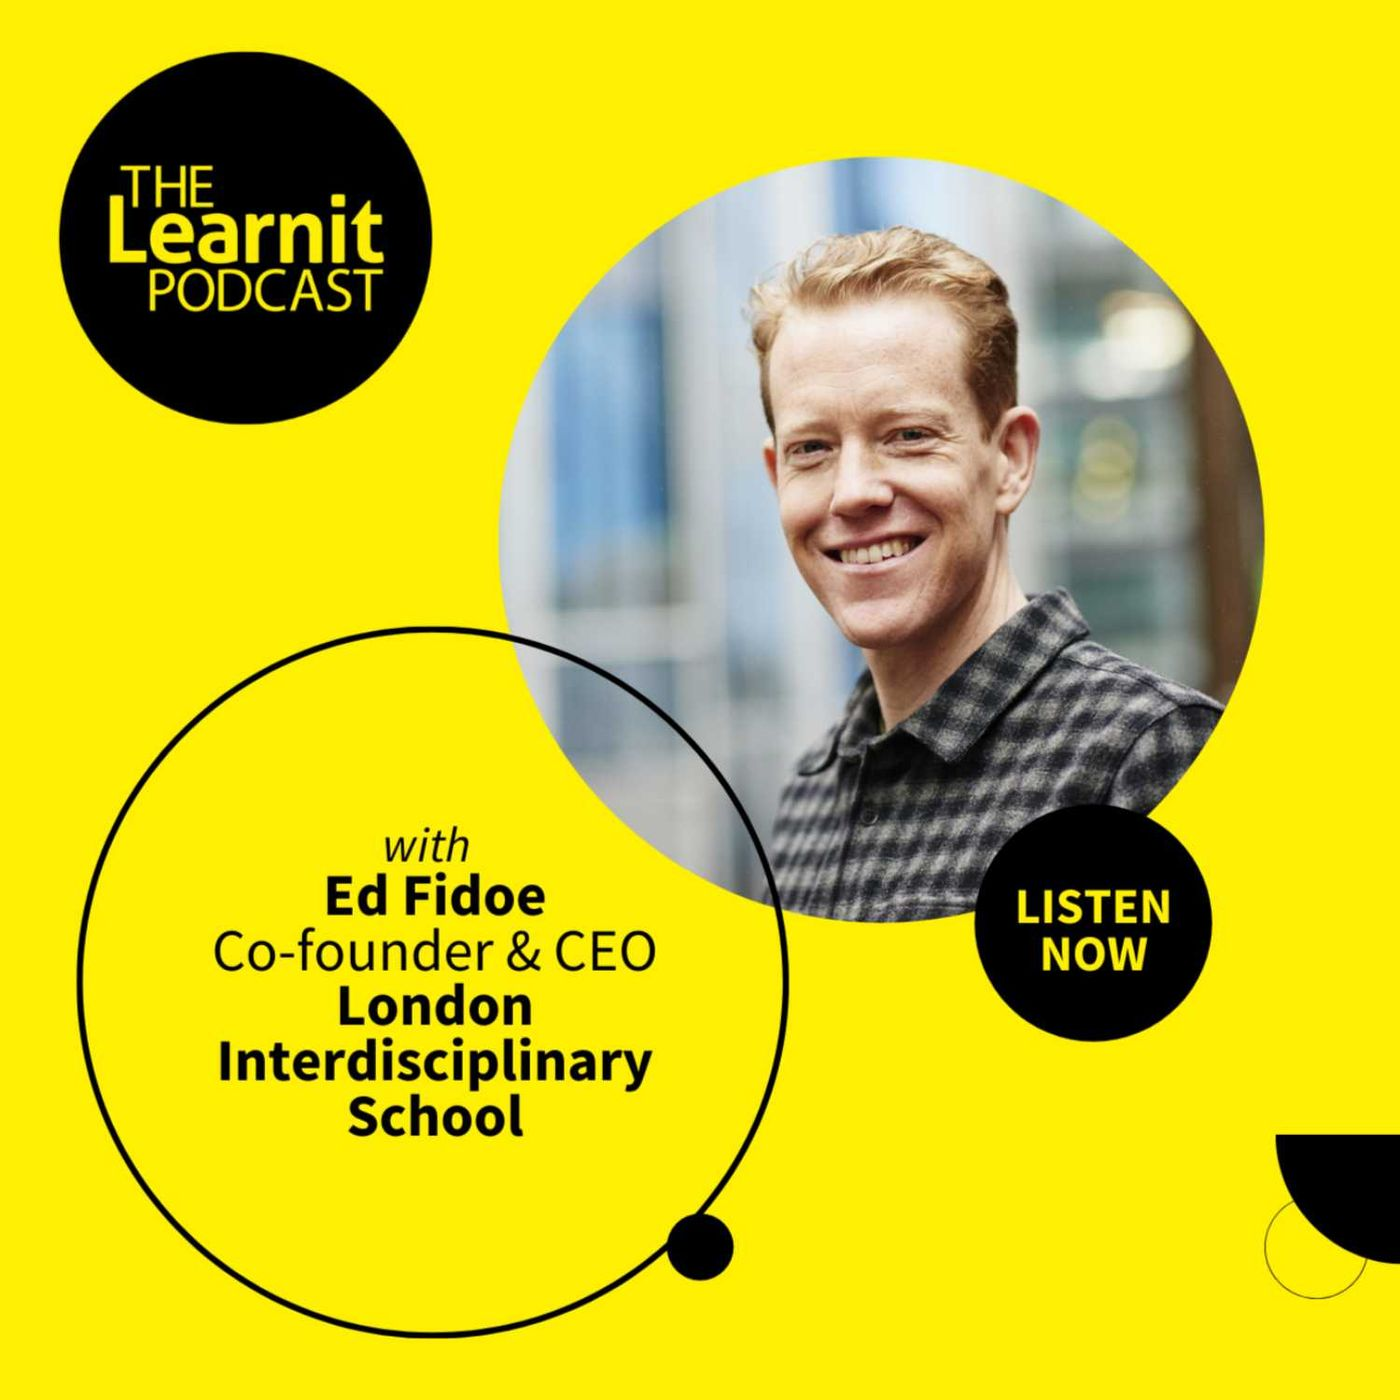 #28, Ed Fidoe, Co-founder & CEO, London Interdisciplinary School: Teaching the Skills Employers Want